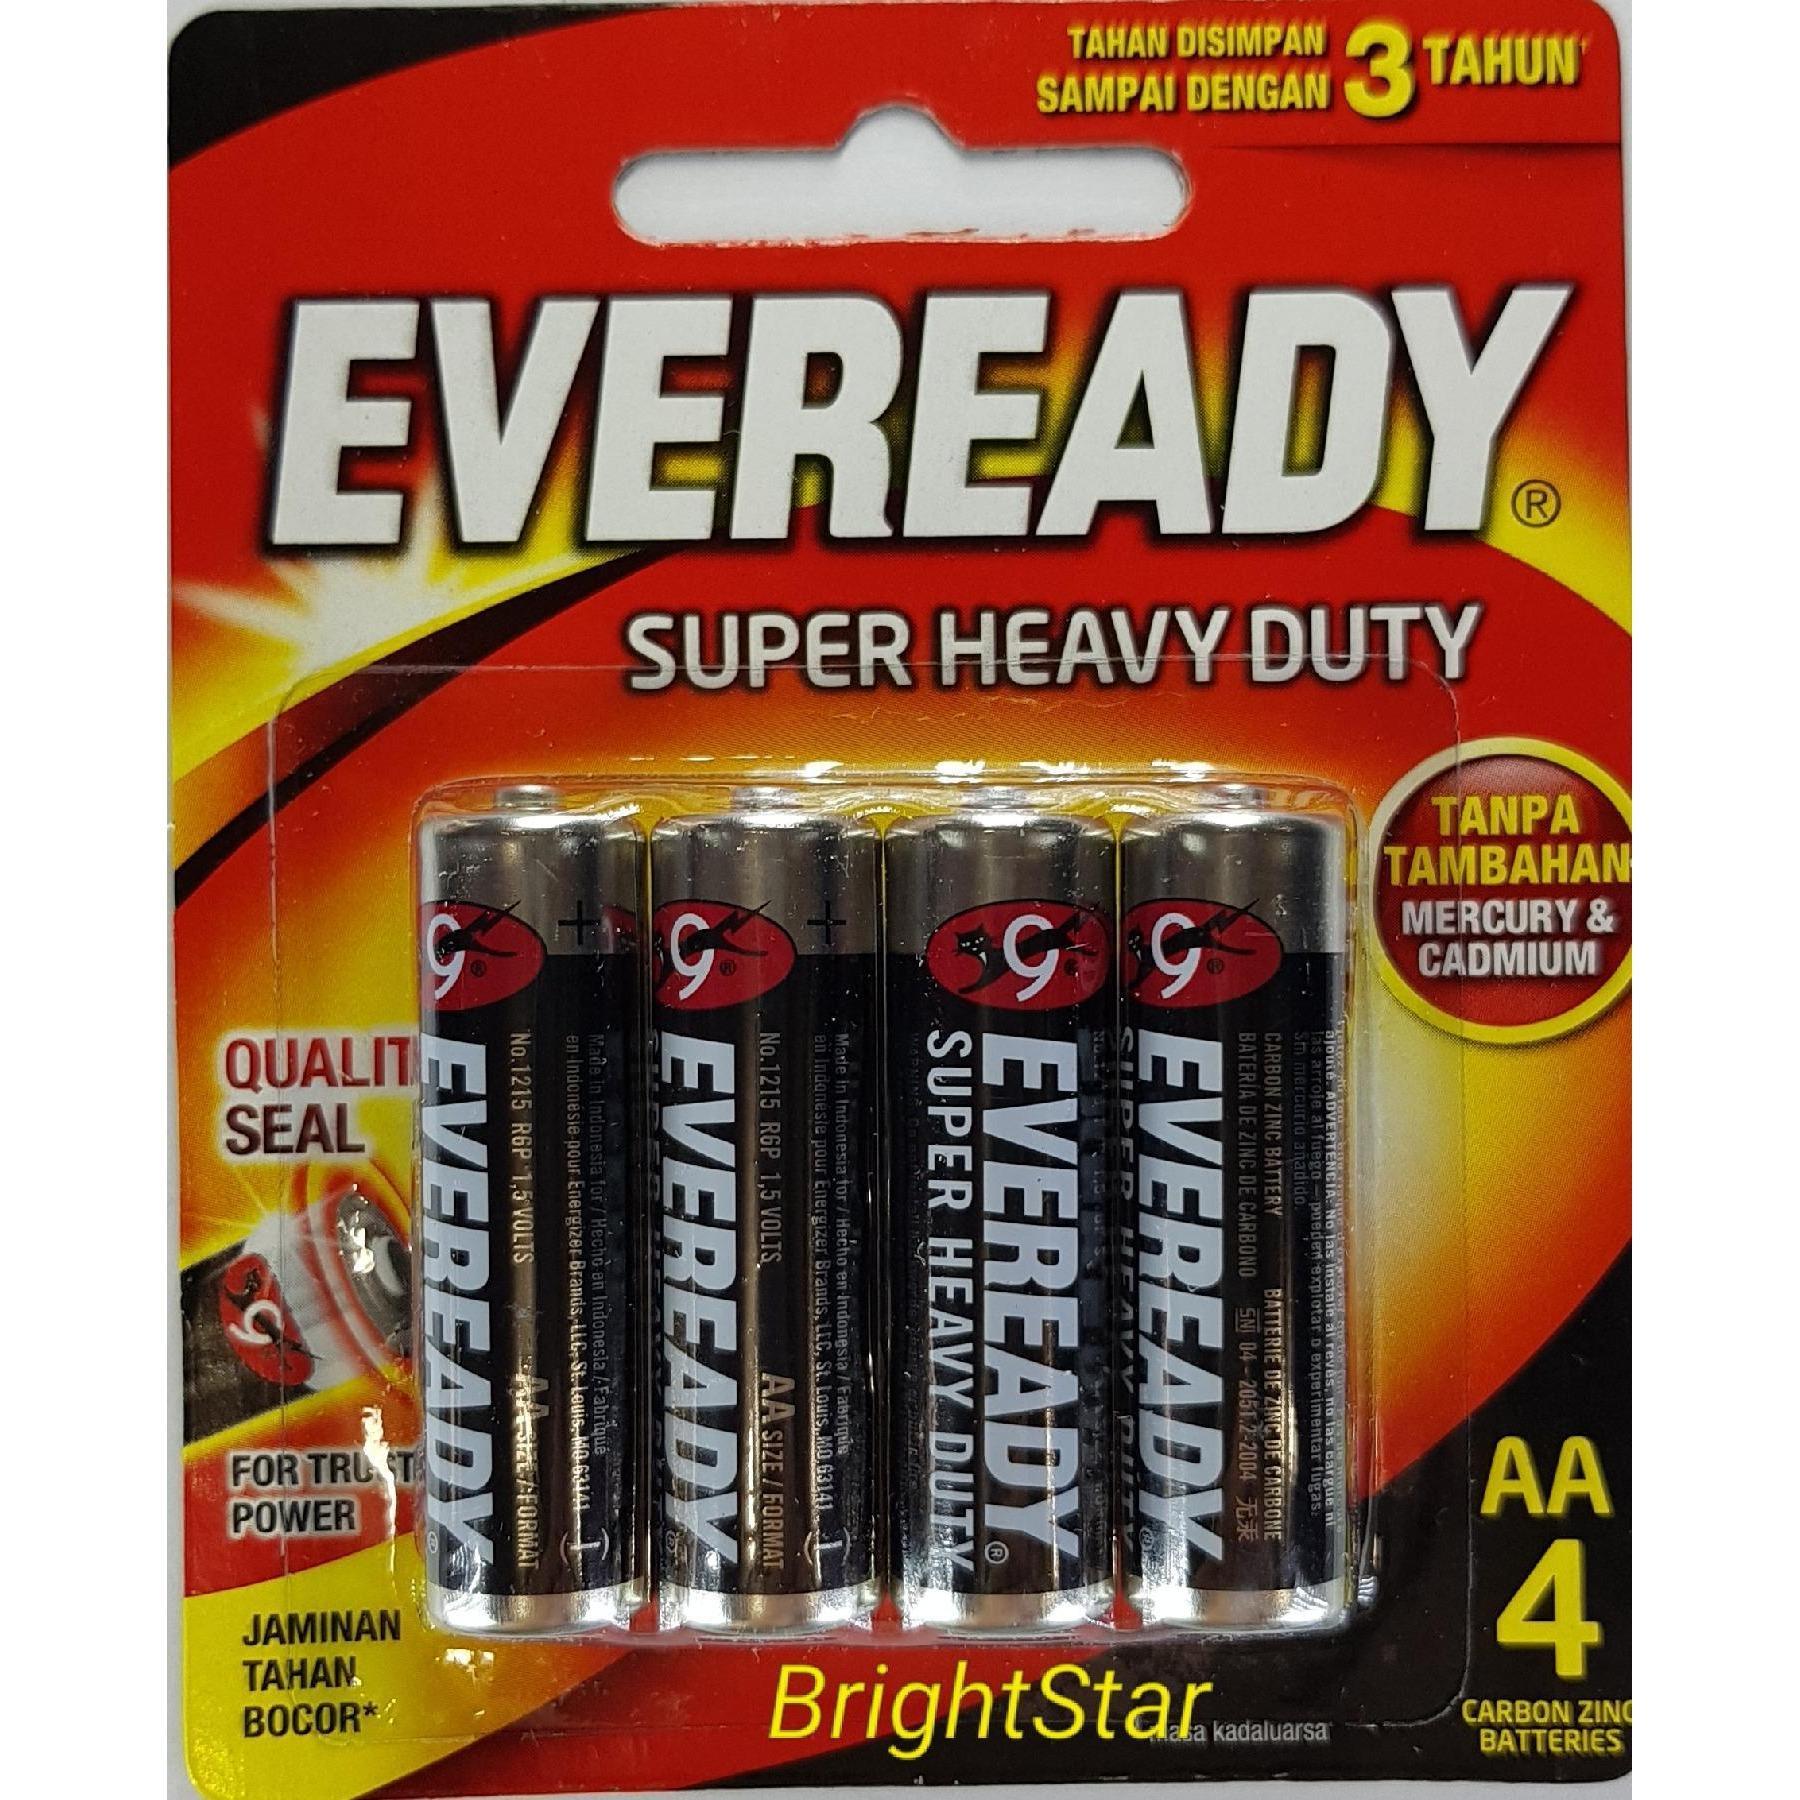 Baterai/Batre EVEREADY AA Hitam (4 PCS/PACK) Super Heavy Duty